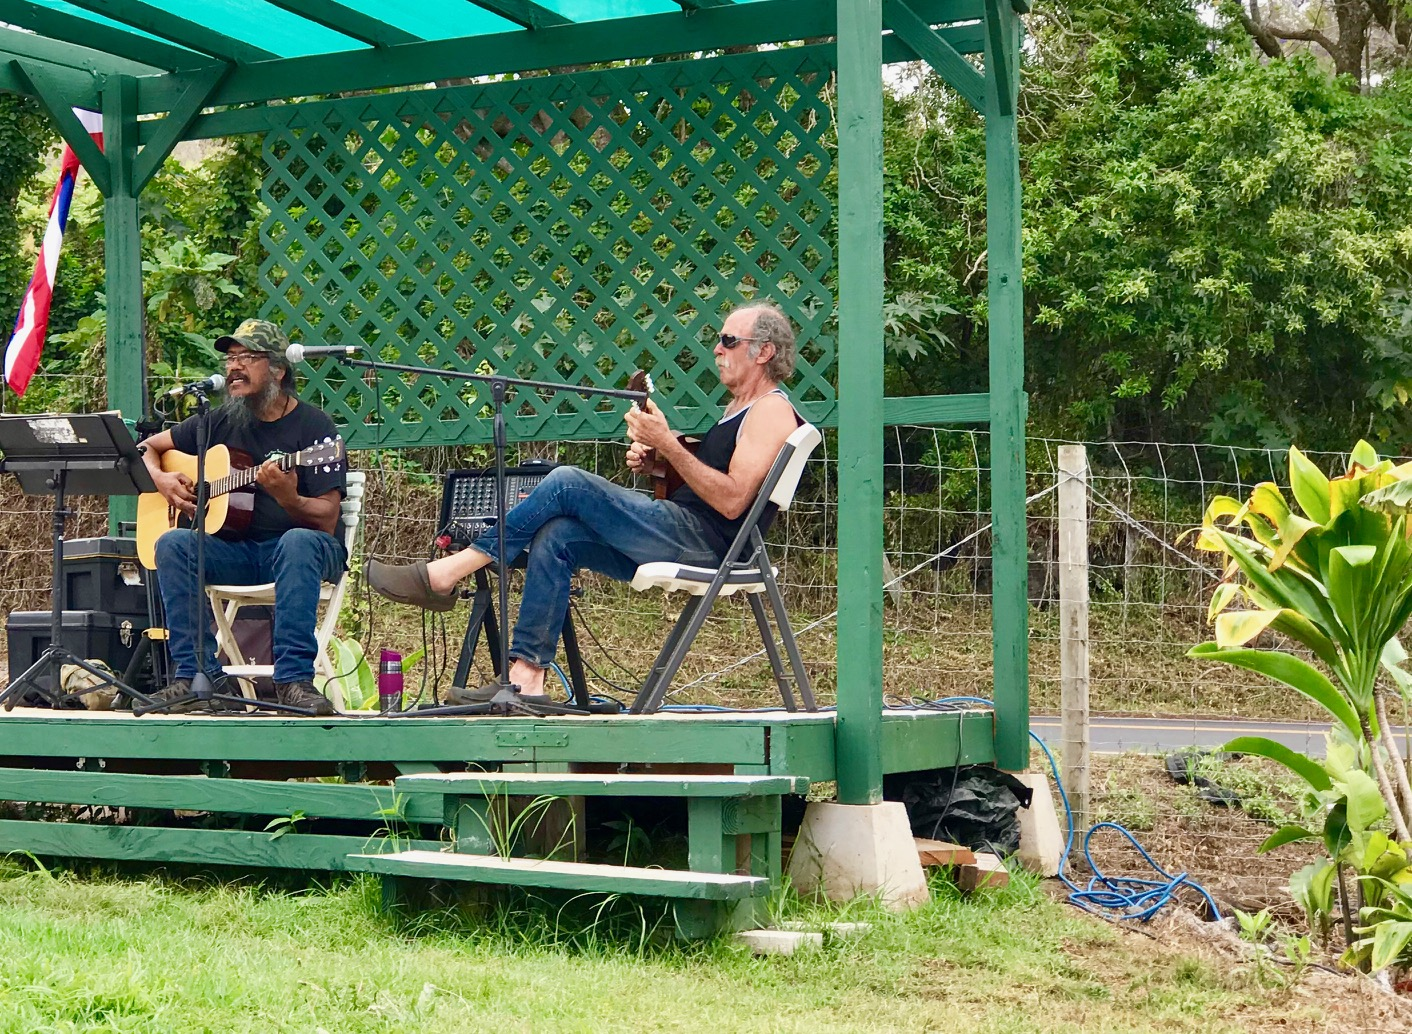 Music and Diverse Goods at Kēōkea Farmers Market